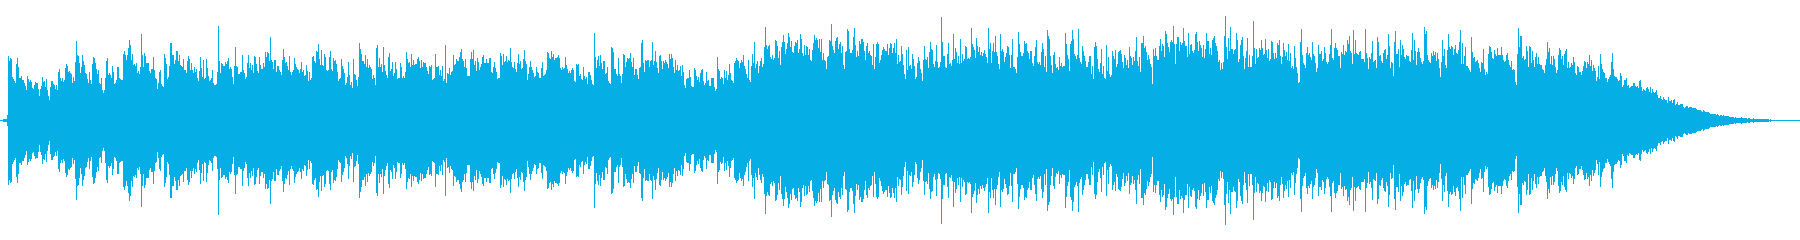 CM・情熱的なフラメンコEDMの再生済みの波形